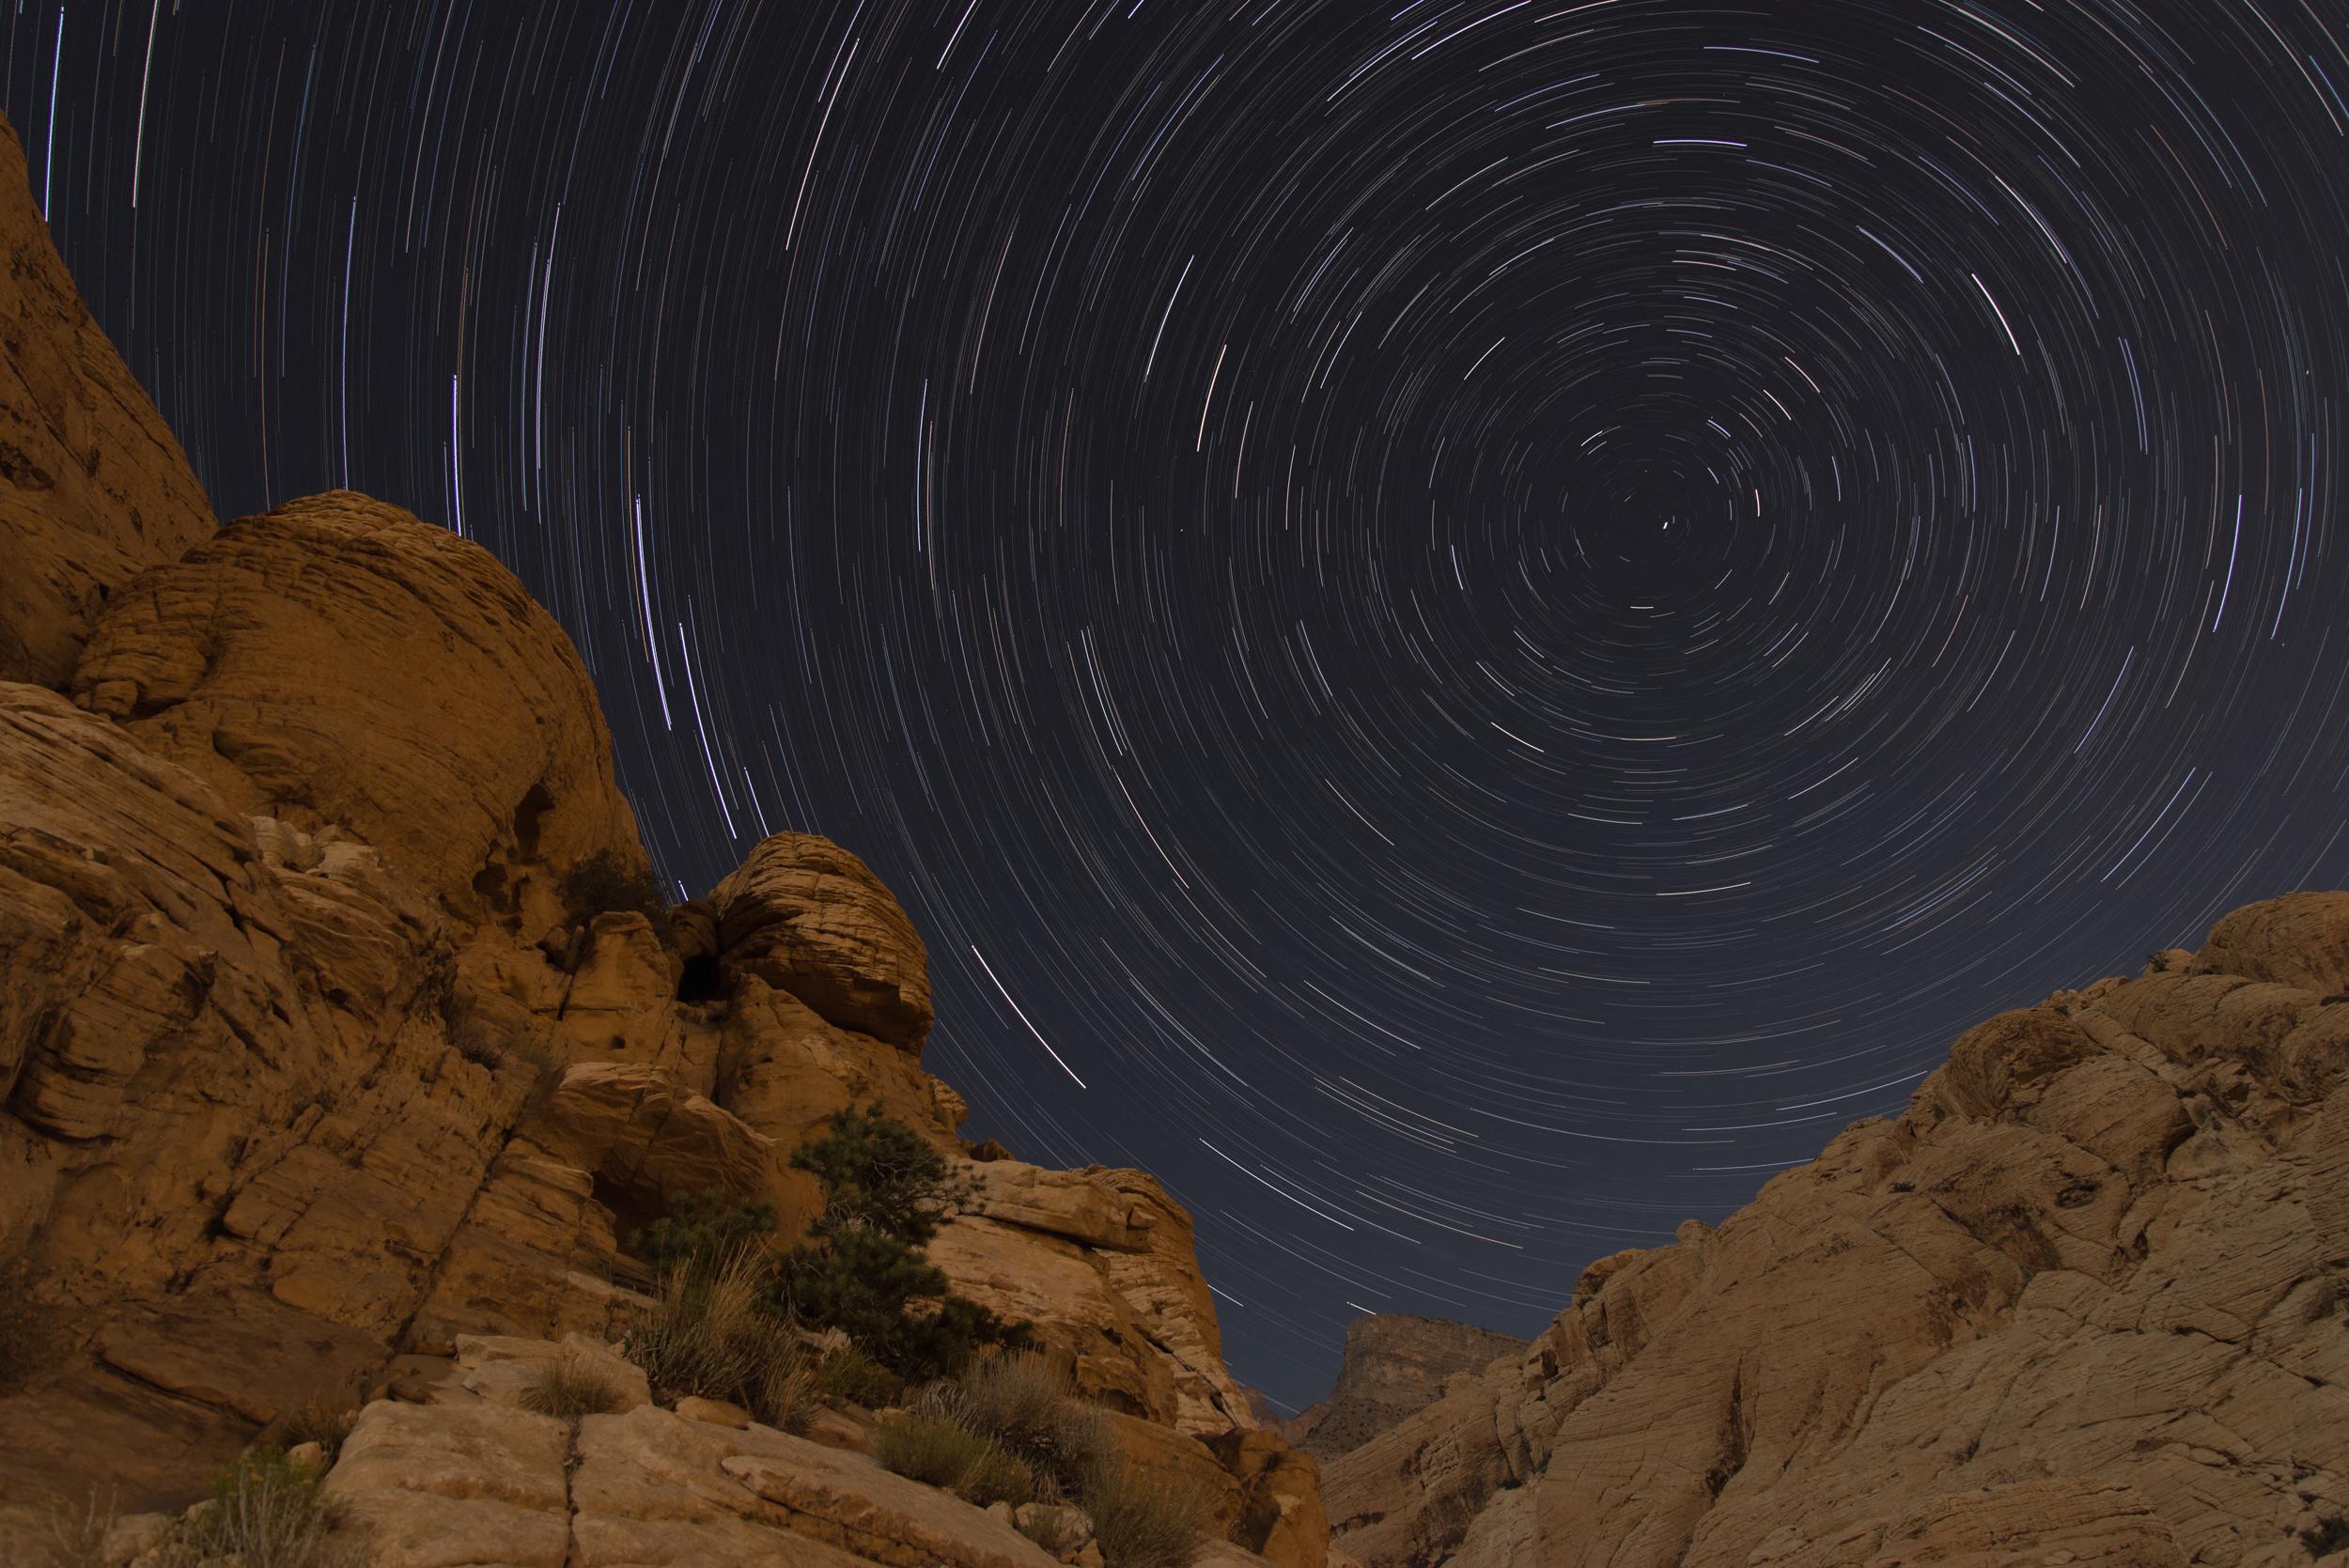 Star Trails - Calico Tanks, NV